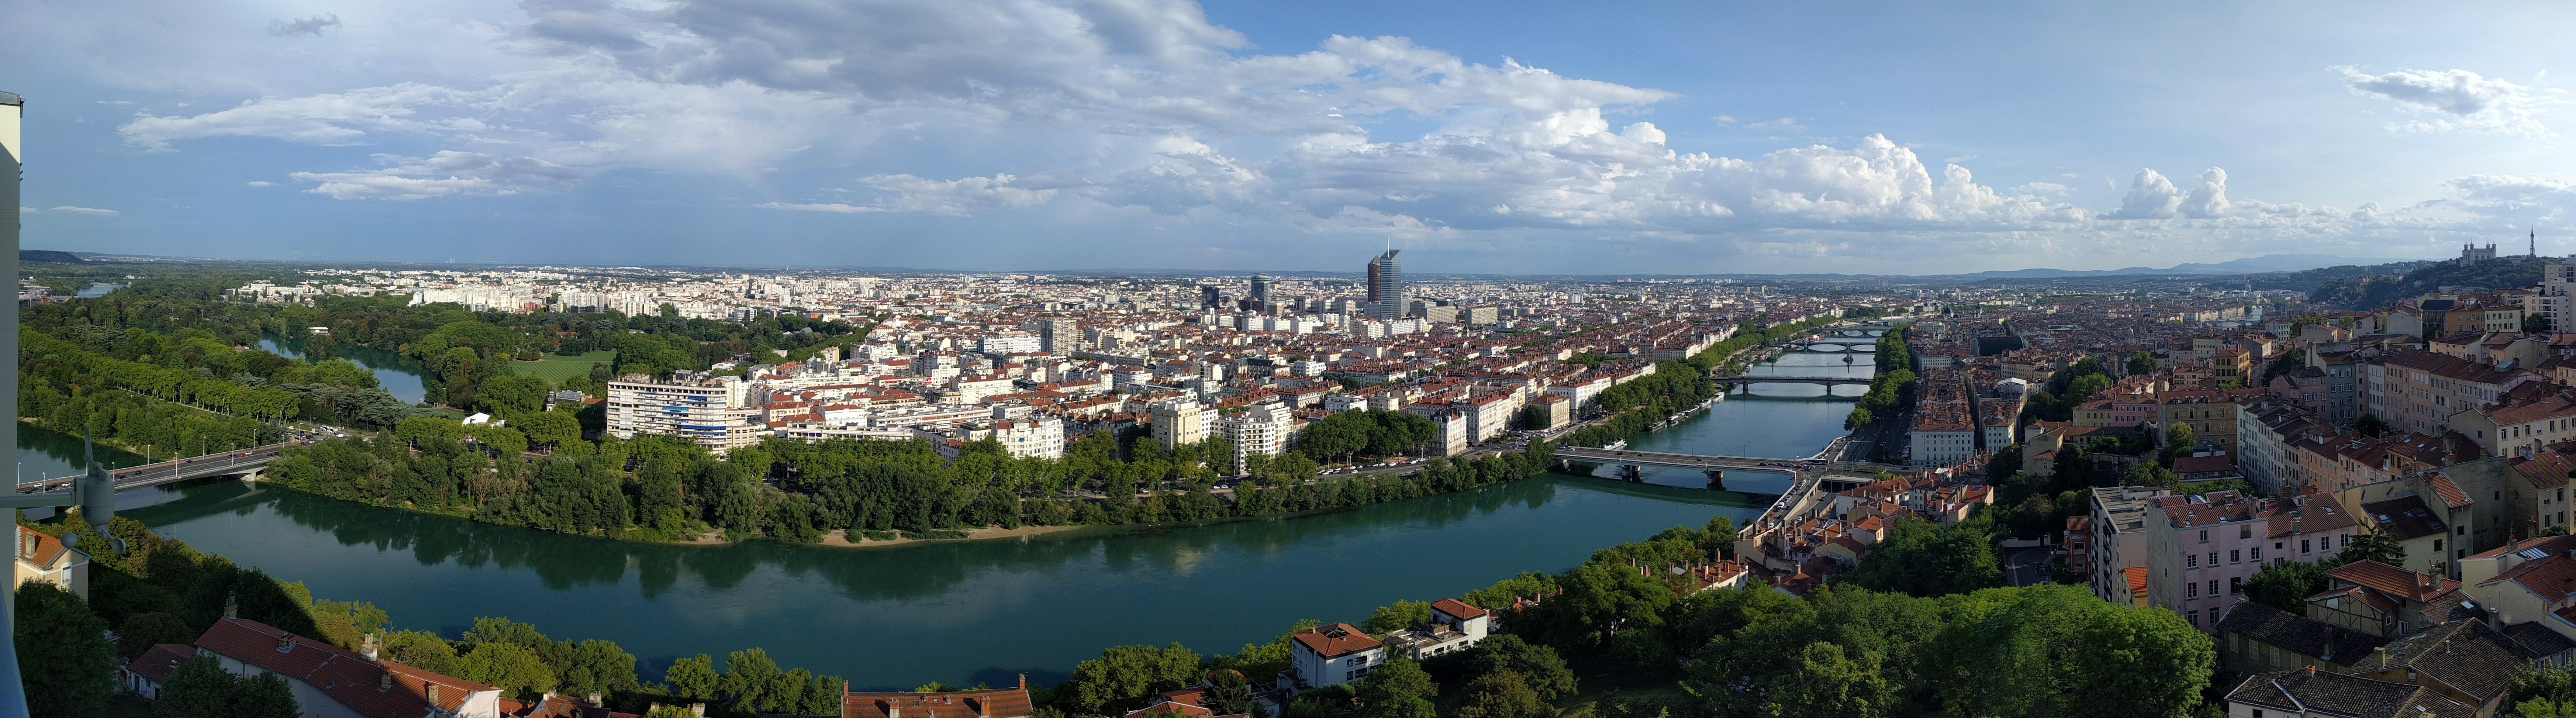 General 6982x1946 Lyon city France cityscape